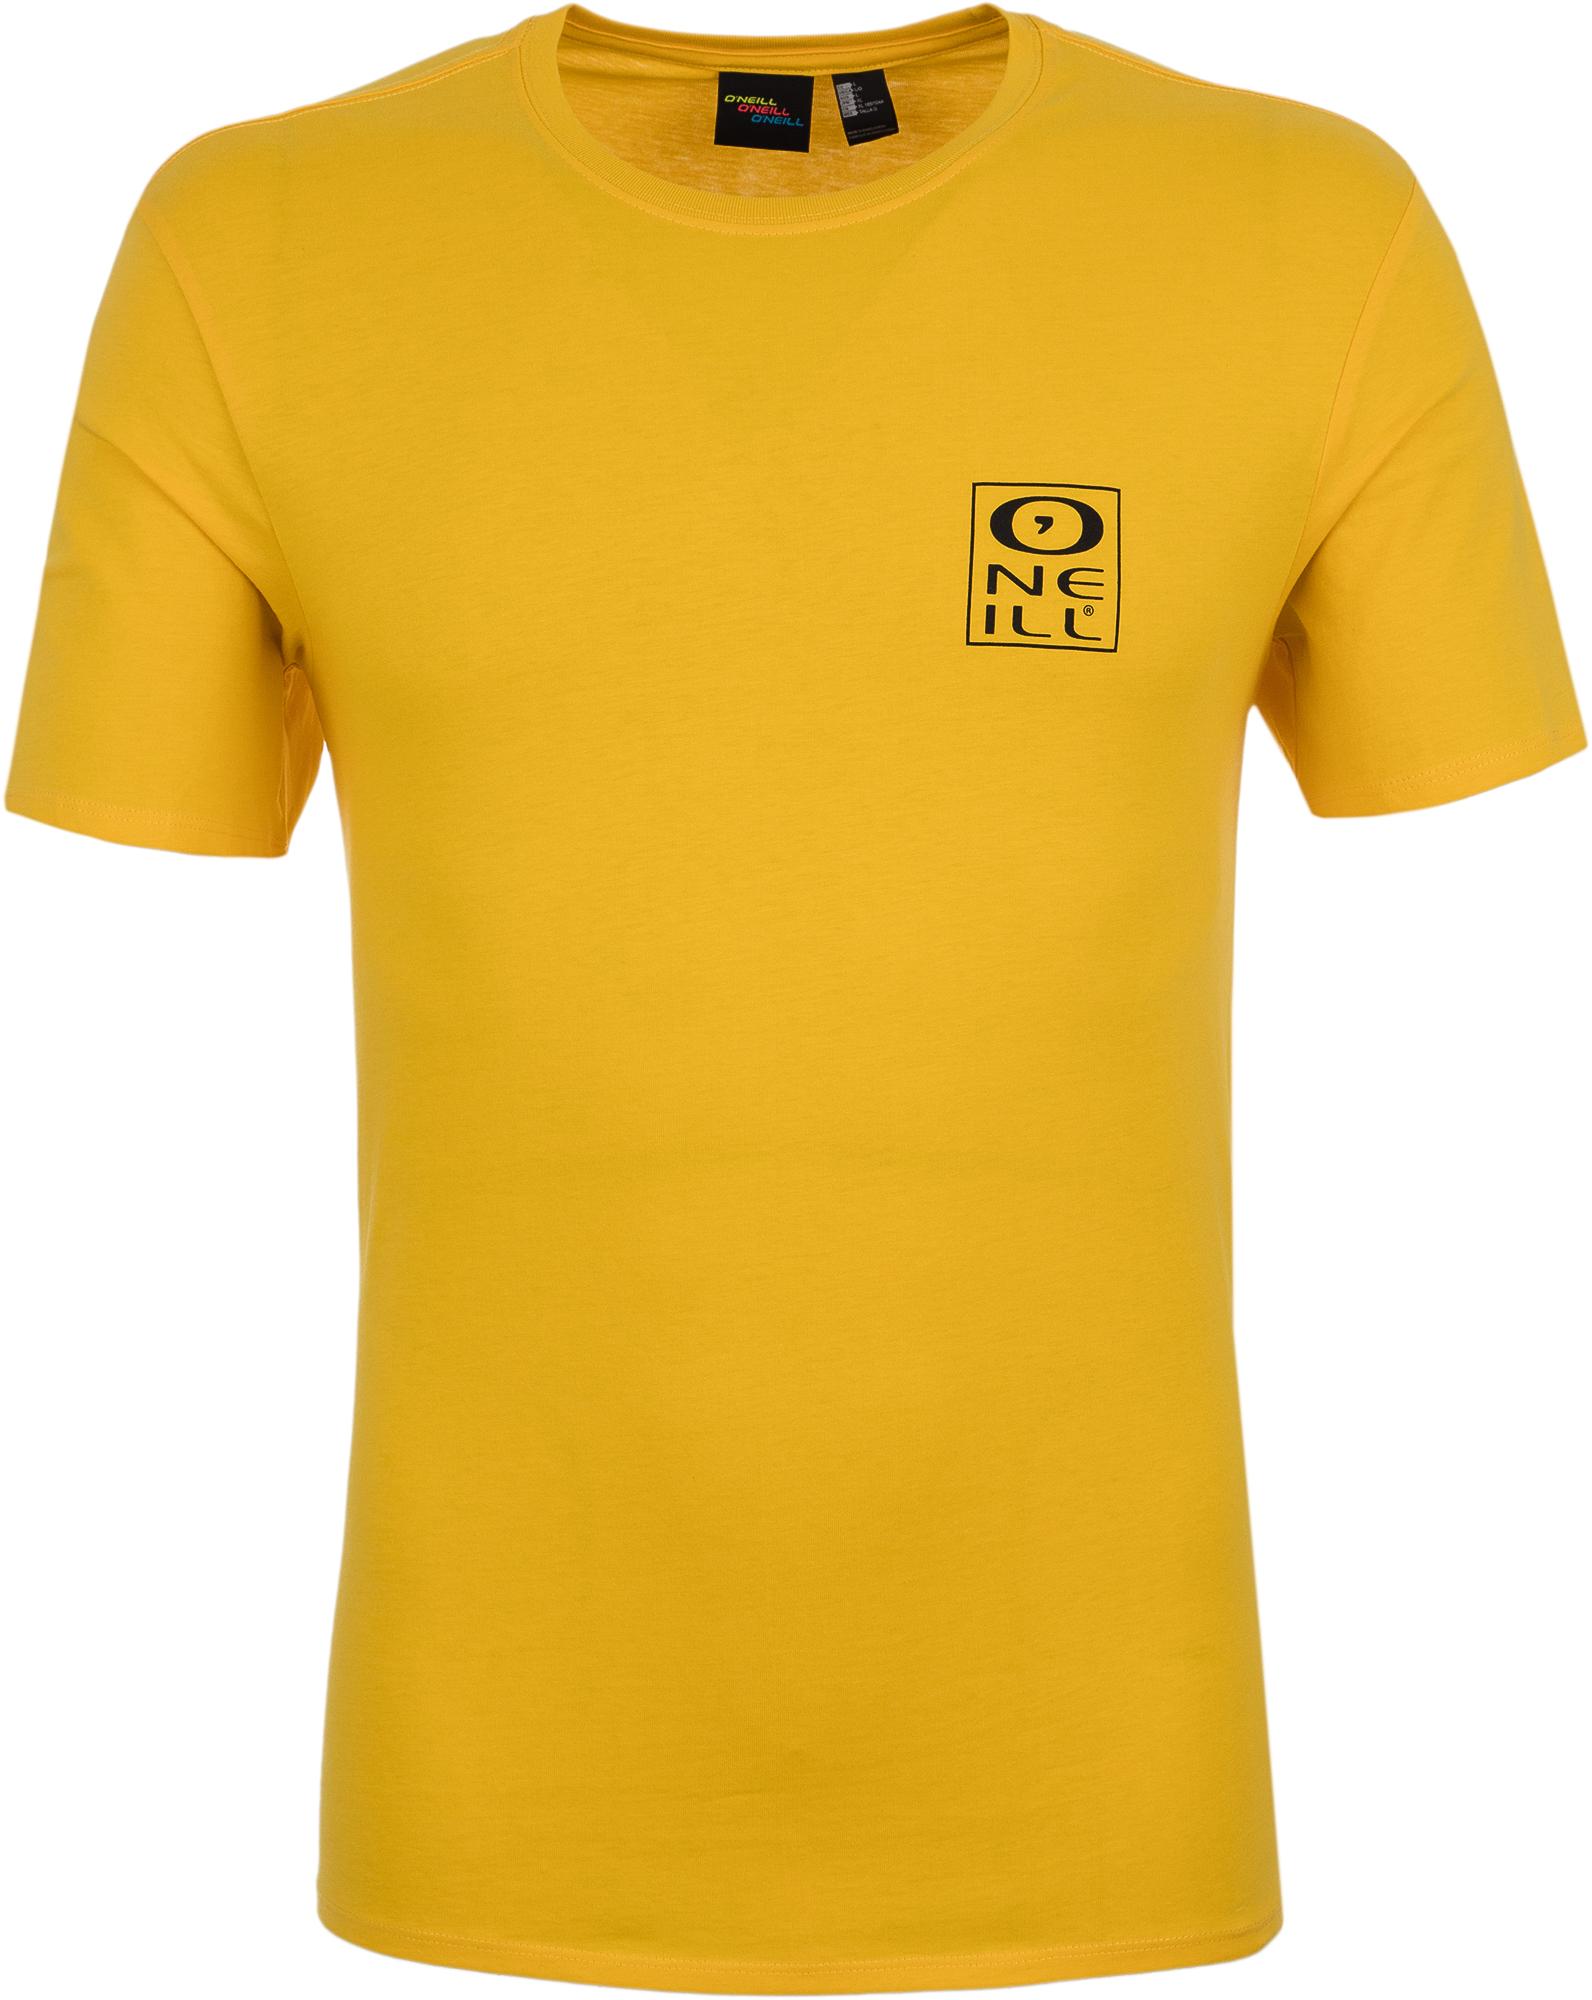 O'Neill Футболка мужская O'Neill Lm Tonal, размер 56-58 цена